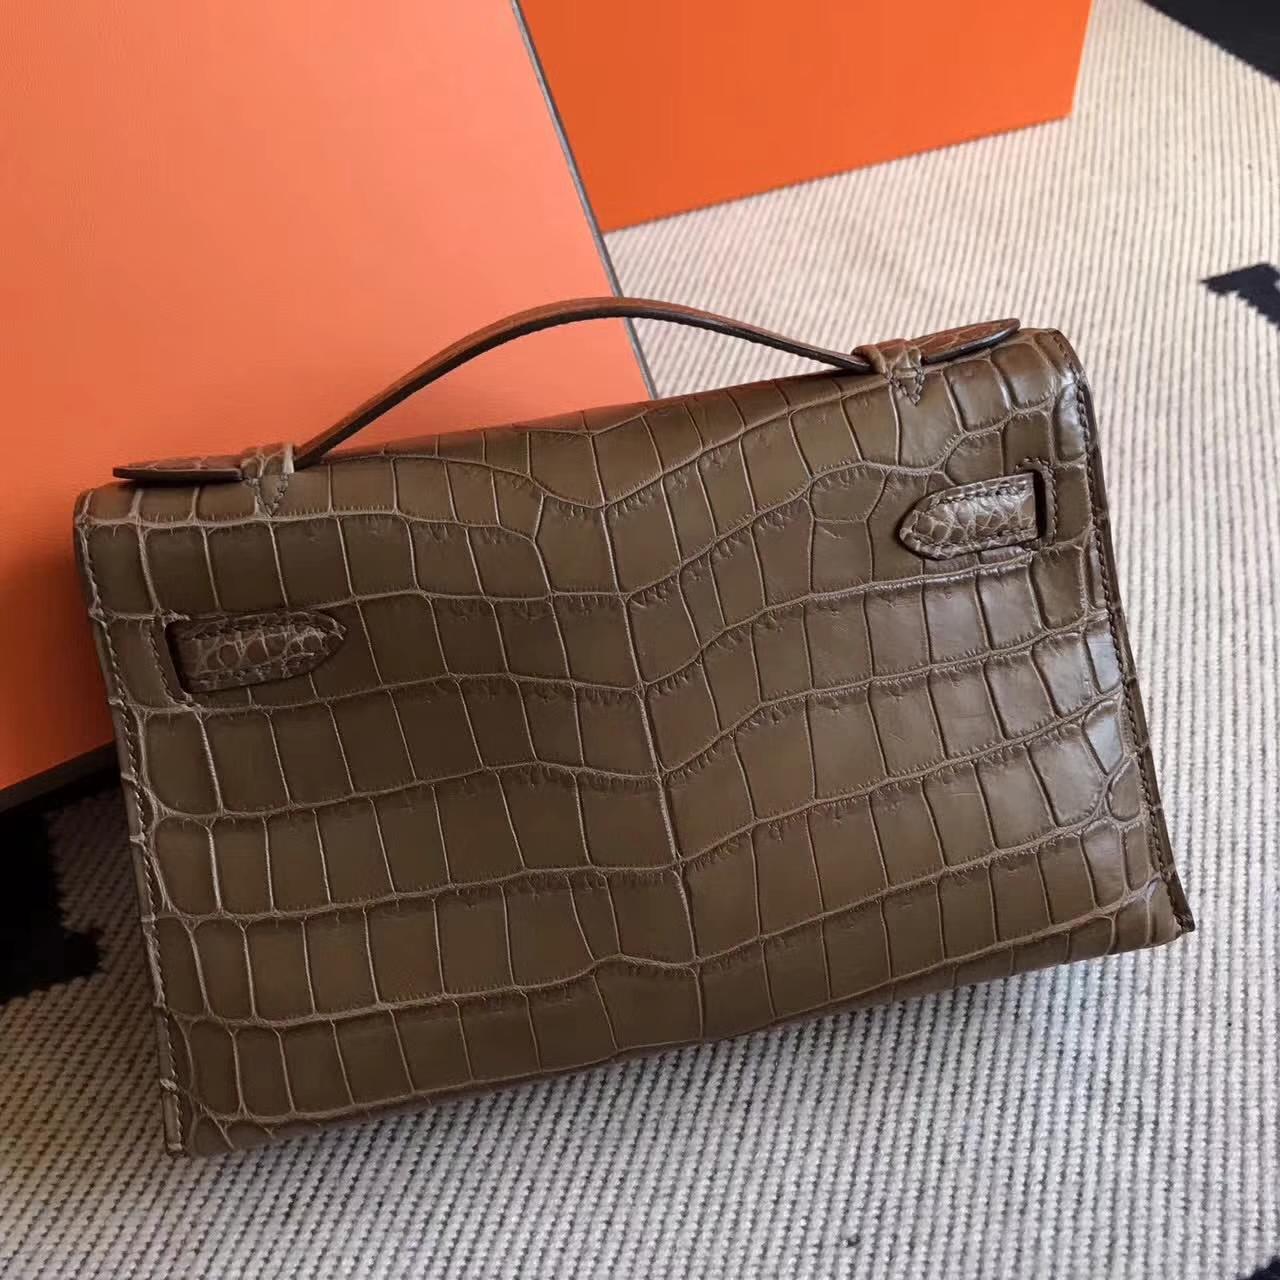 New Arrival Hermes Dark Coffee Matt Crocodile Leather Minikelly22cm Bag